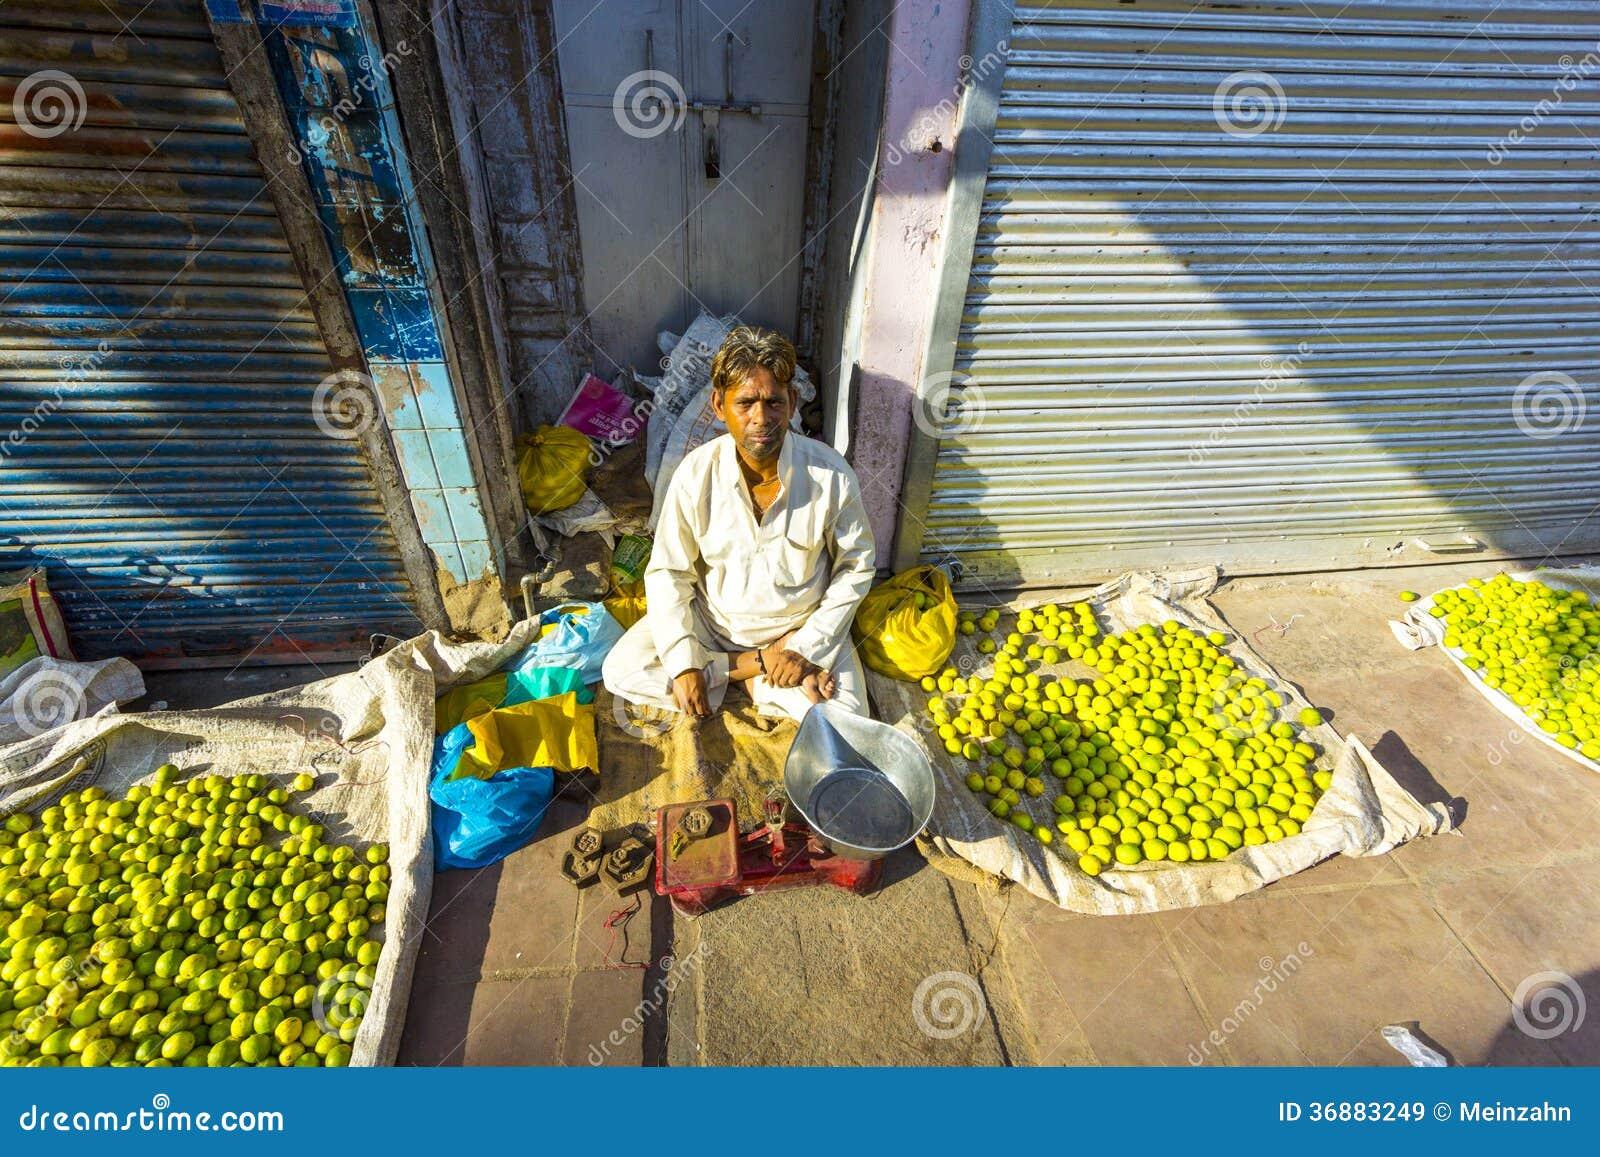 Typical vegetable street market